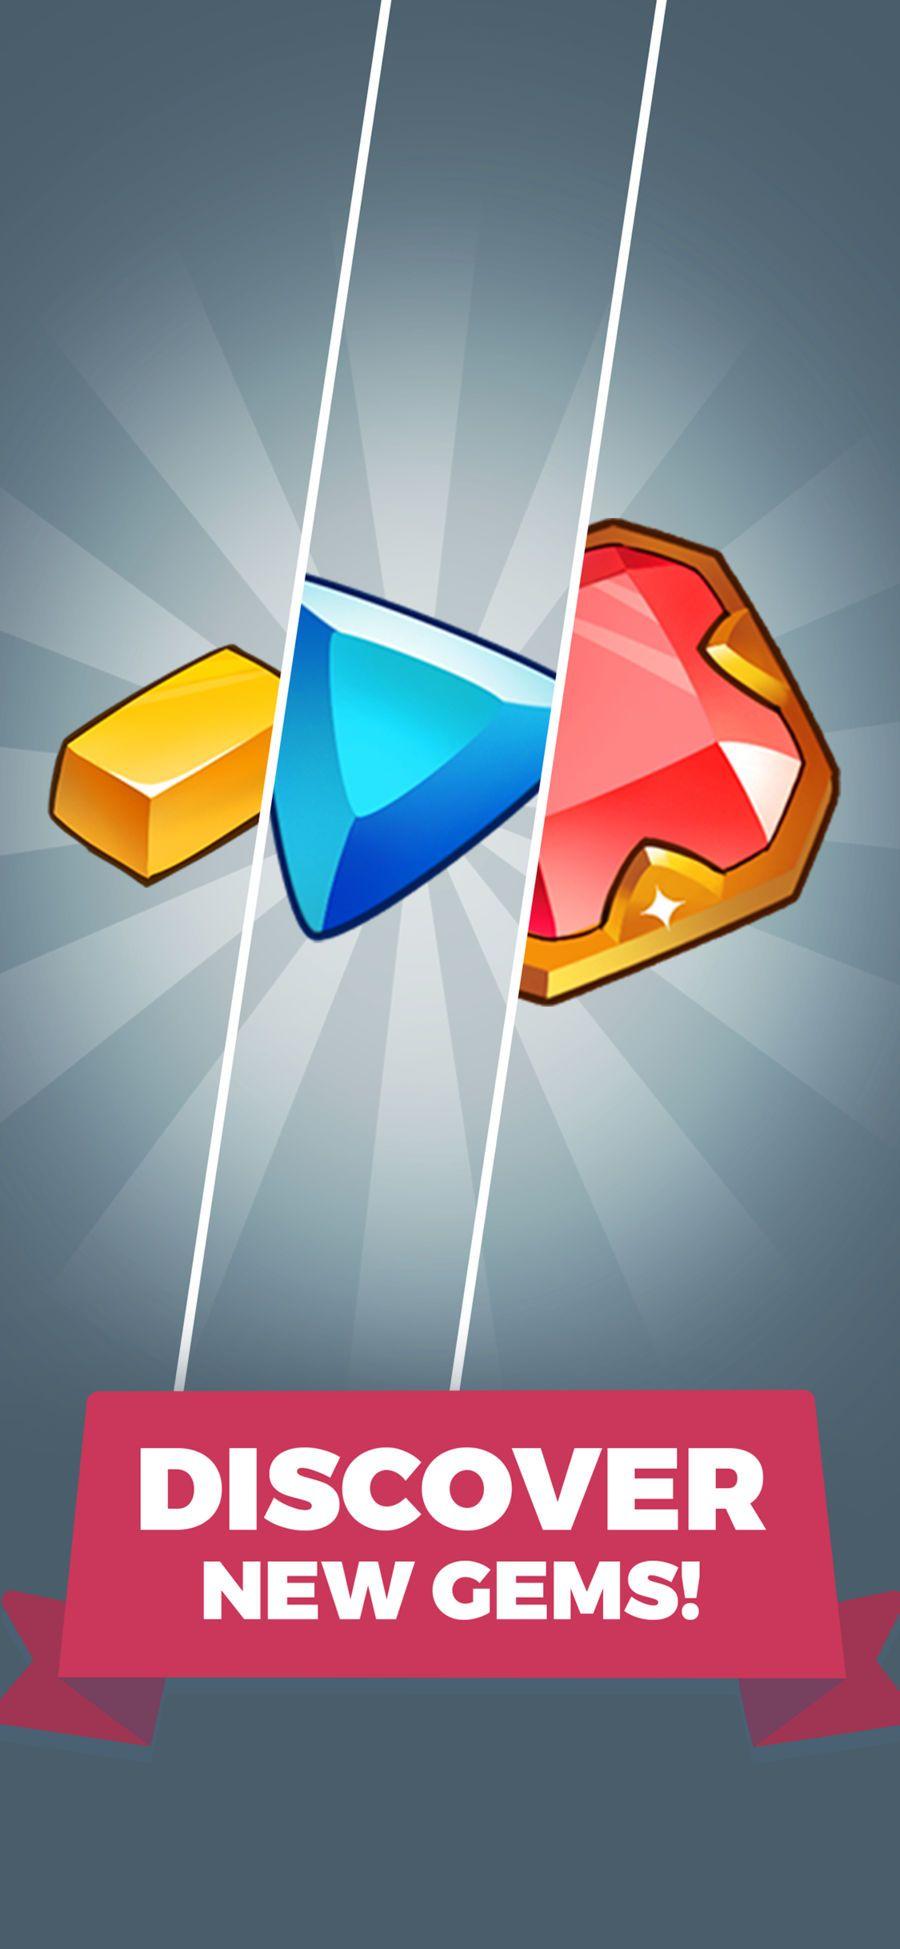 Merge gems puzzlesimulationappsios with images